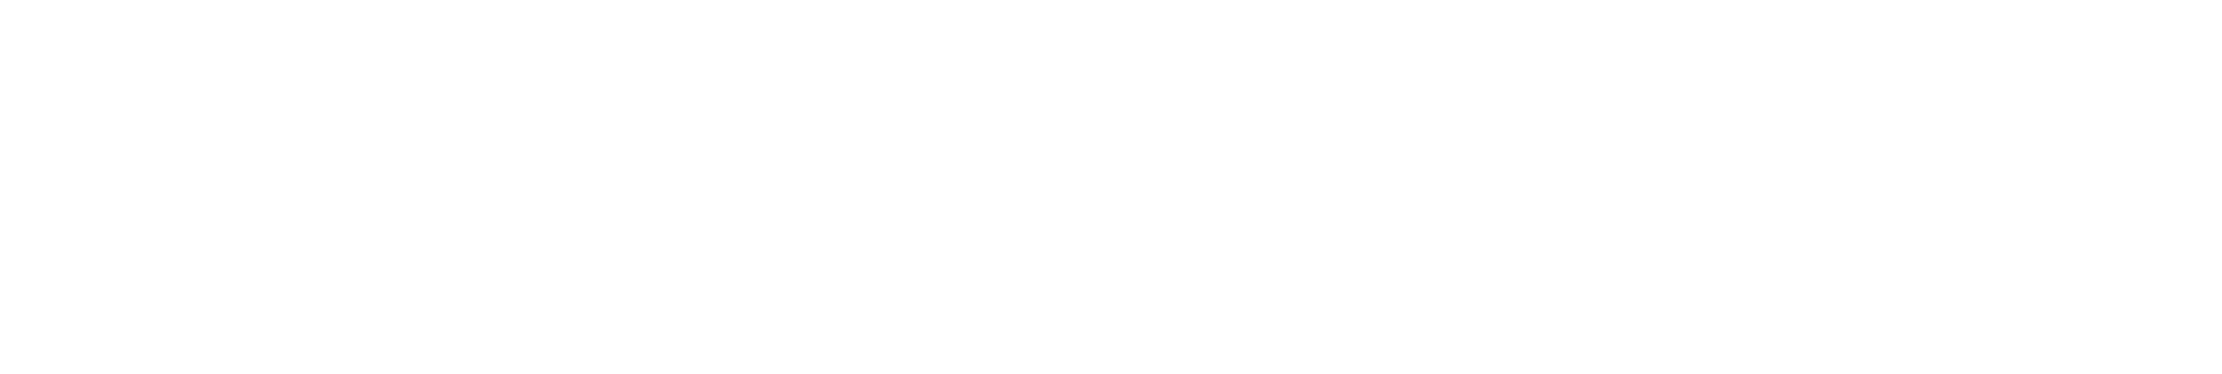 top-blanco